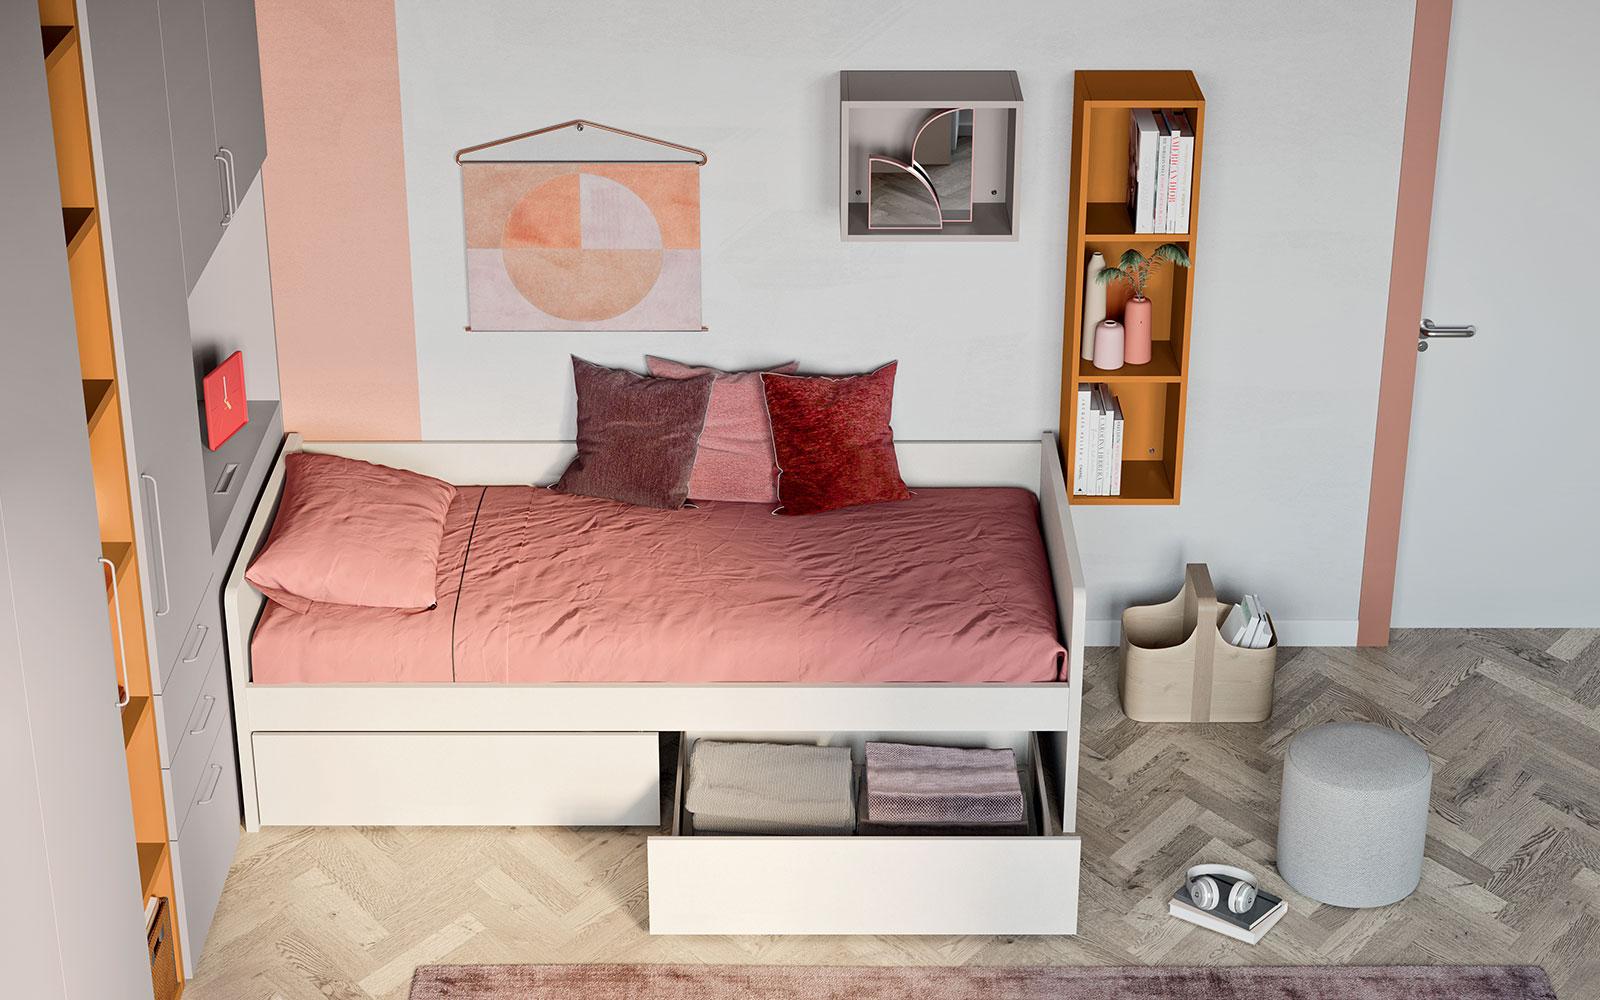 camerette-mobili-ricci05